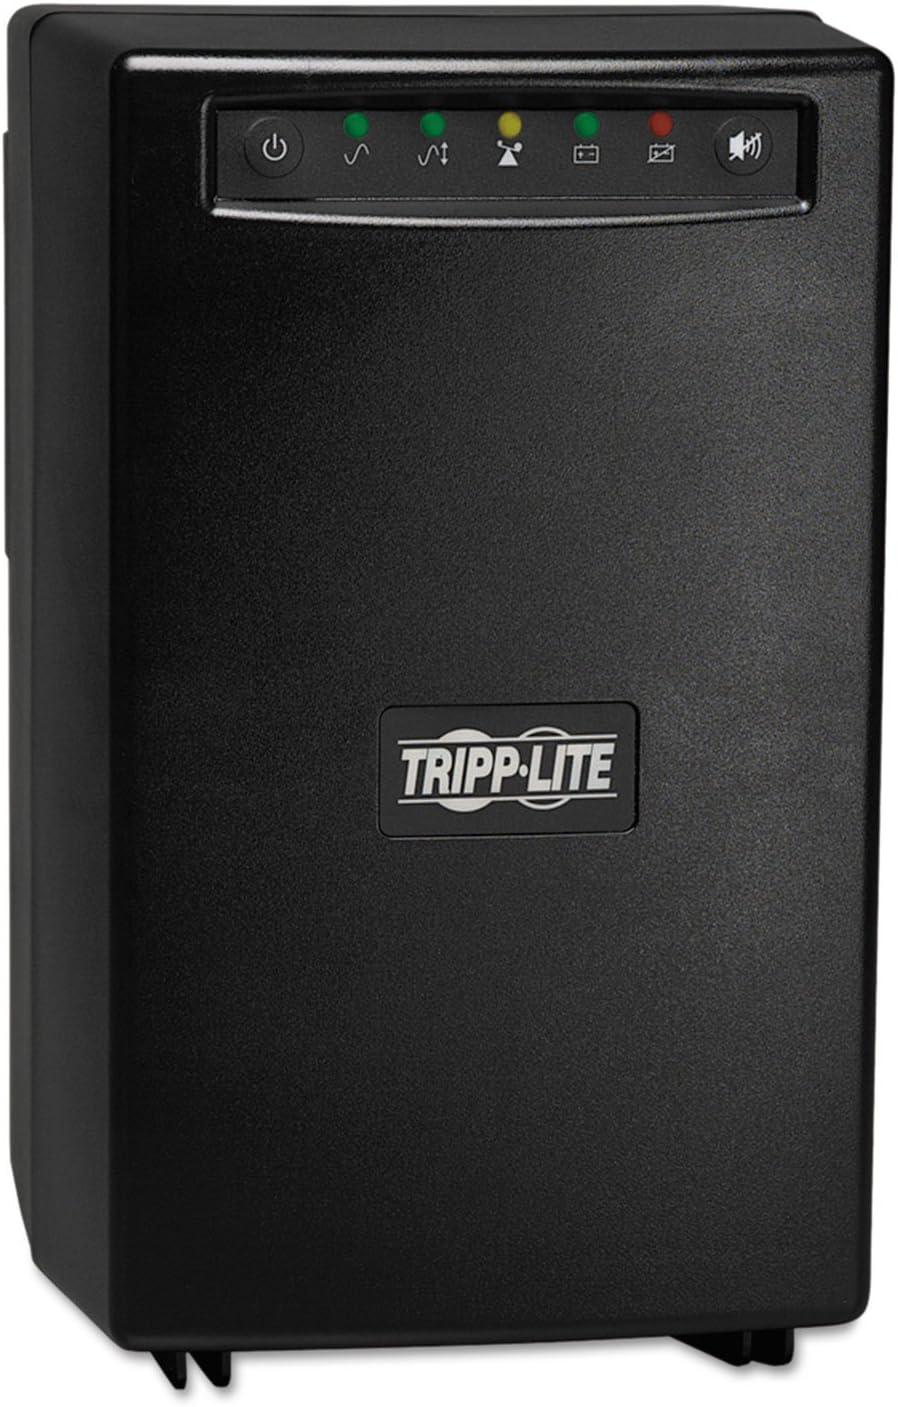 Tripp Lite OMNIVS1500XL OMNIVS1500XL OmniVS Series UPS System, 8 Outlets, 1500 VA, 690 J